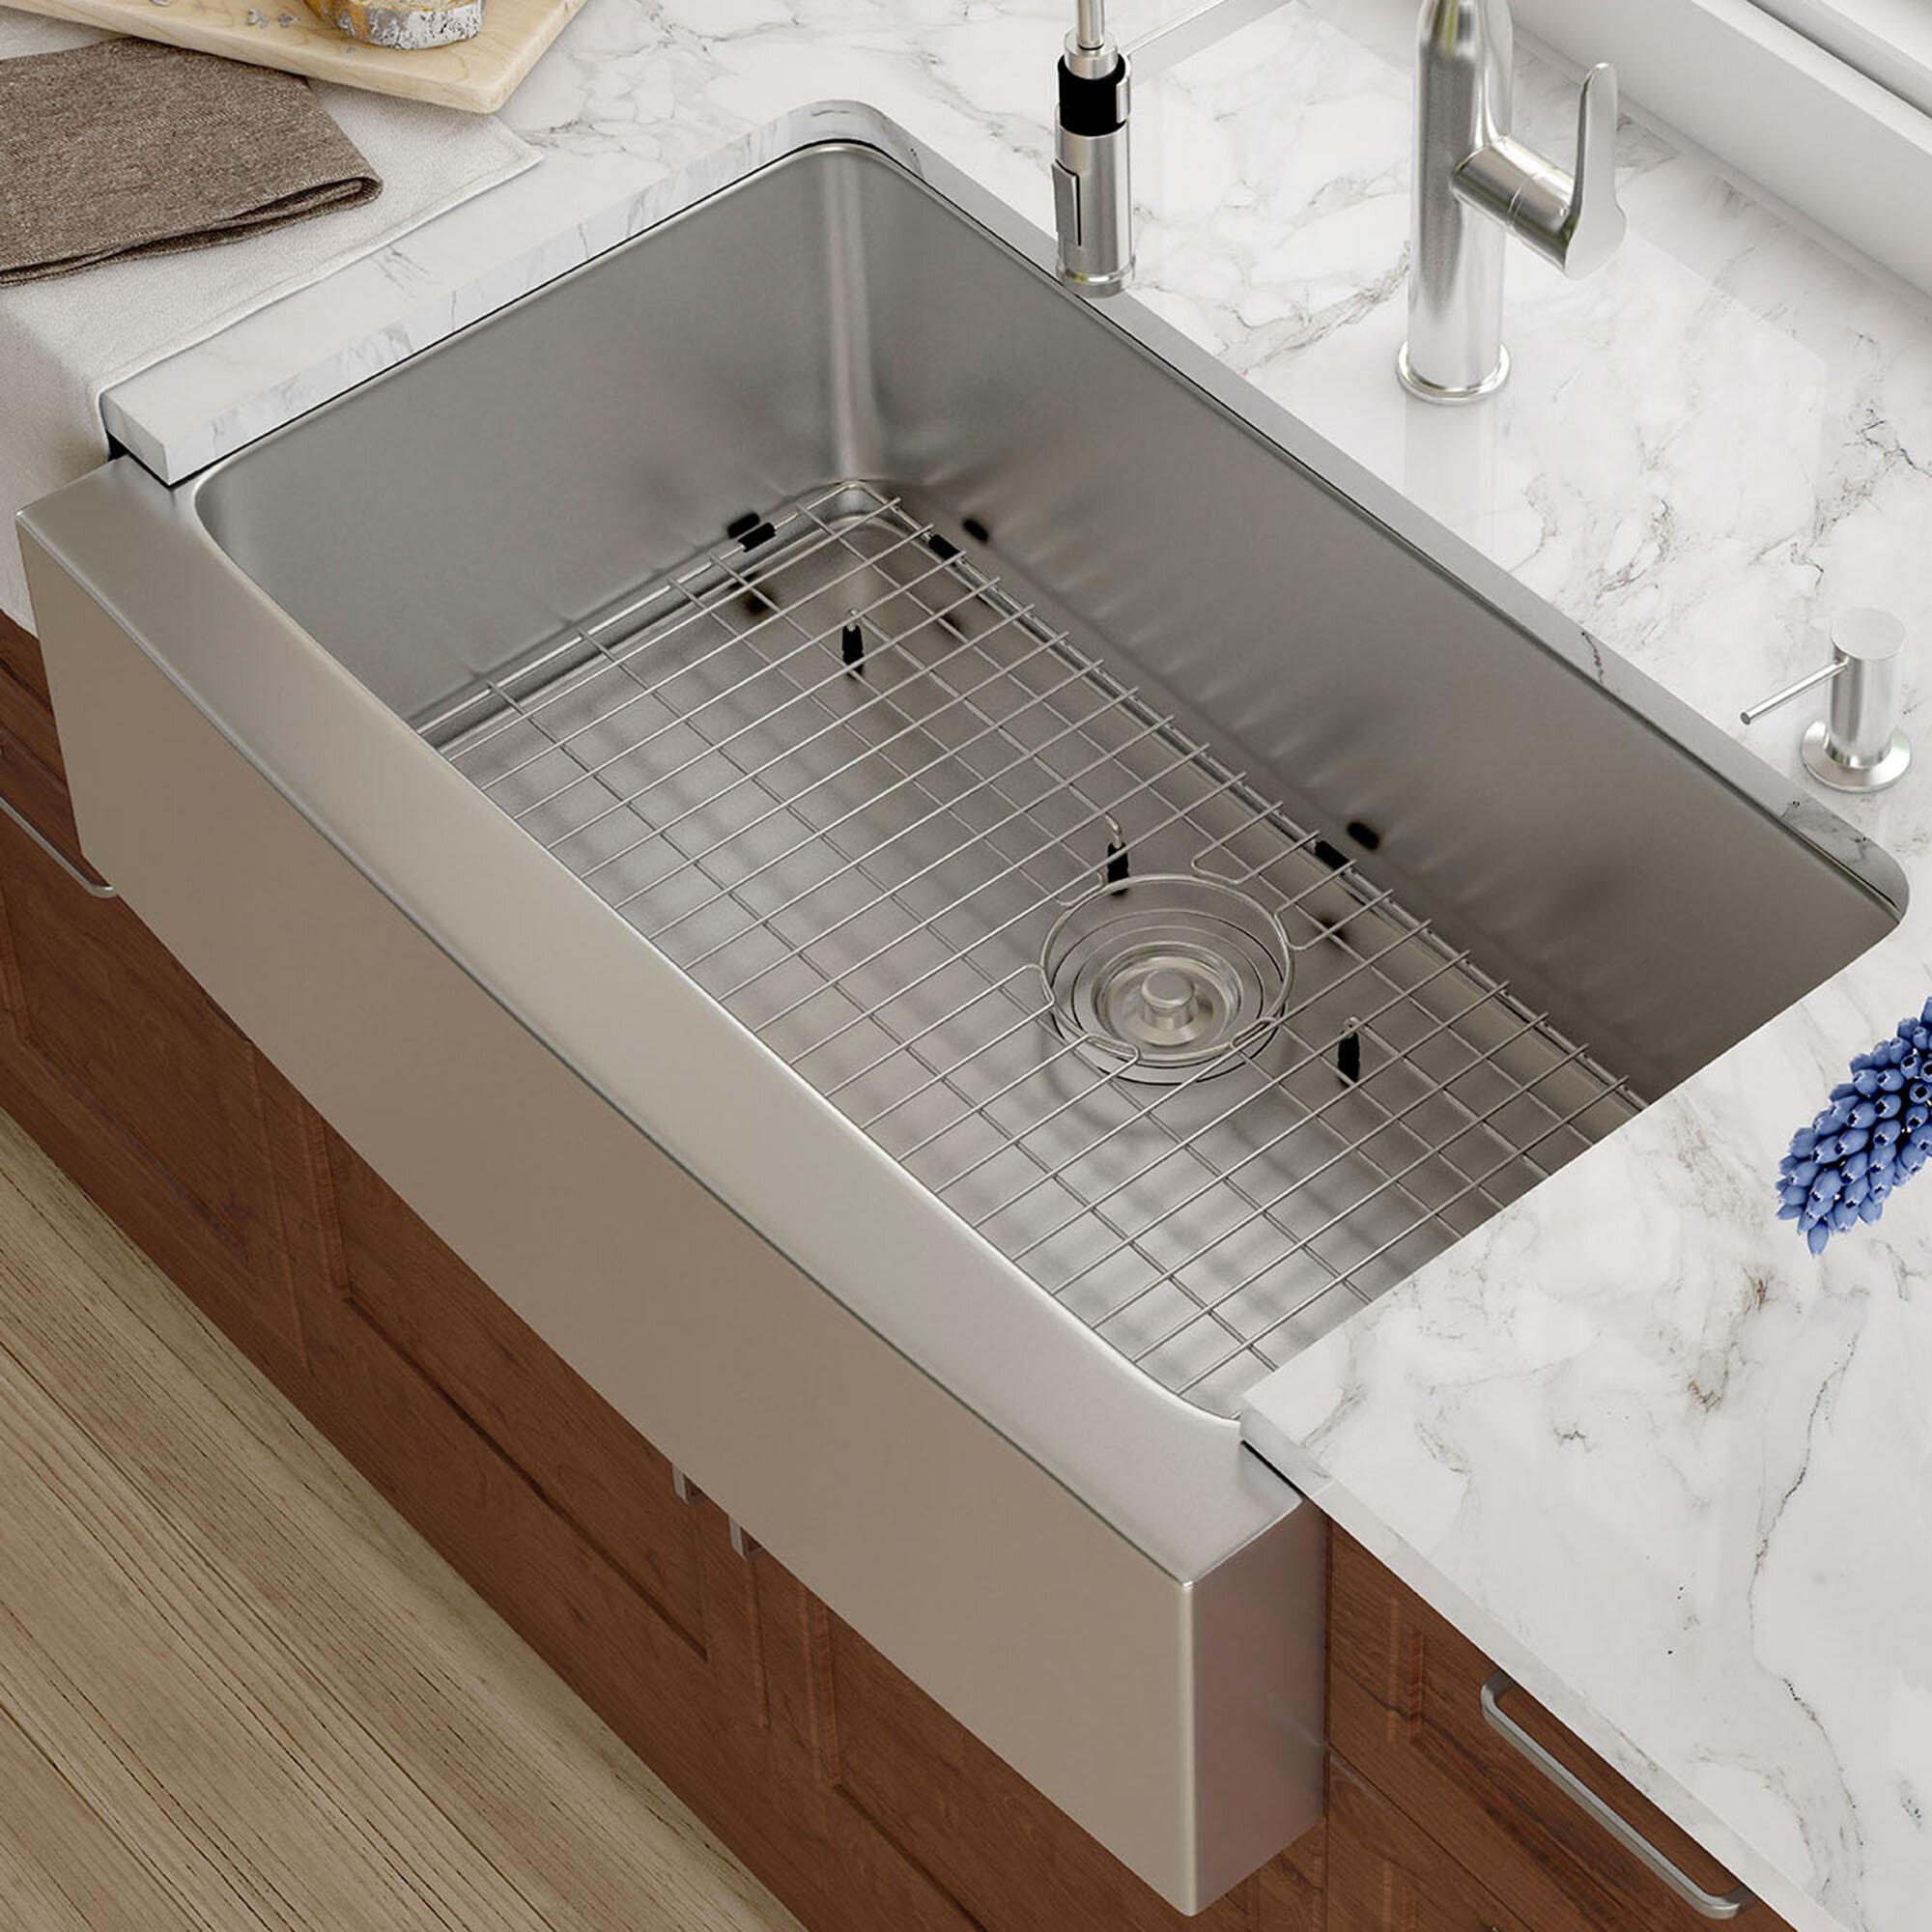 Kraus 33 x 21 farmhouse kitchen sink with drain assembly reviews kraus 33 x 21 farmhouse kitchen sink with drain assembly reviews wayfair workwithnaturefo